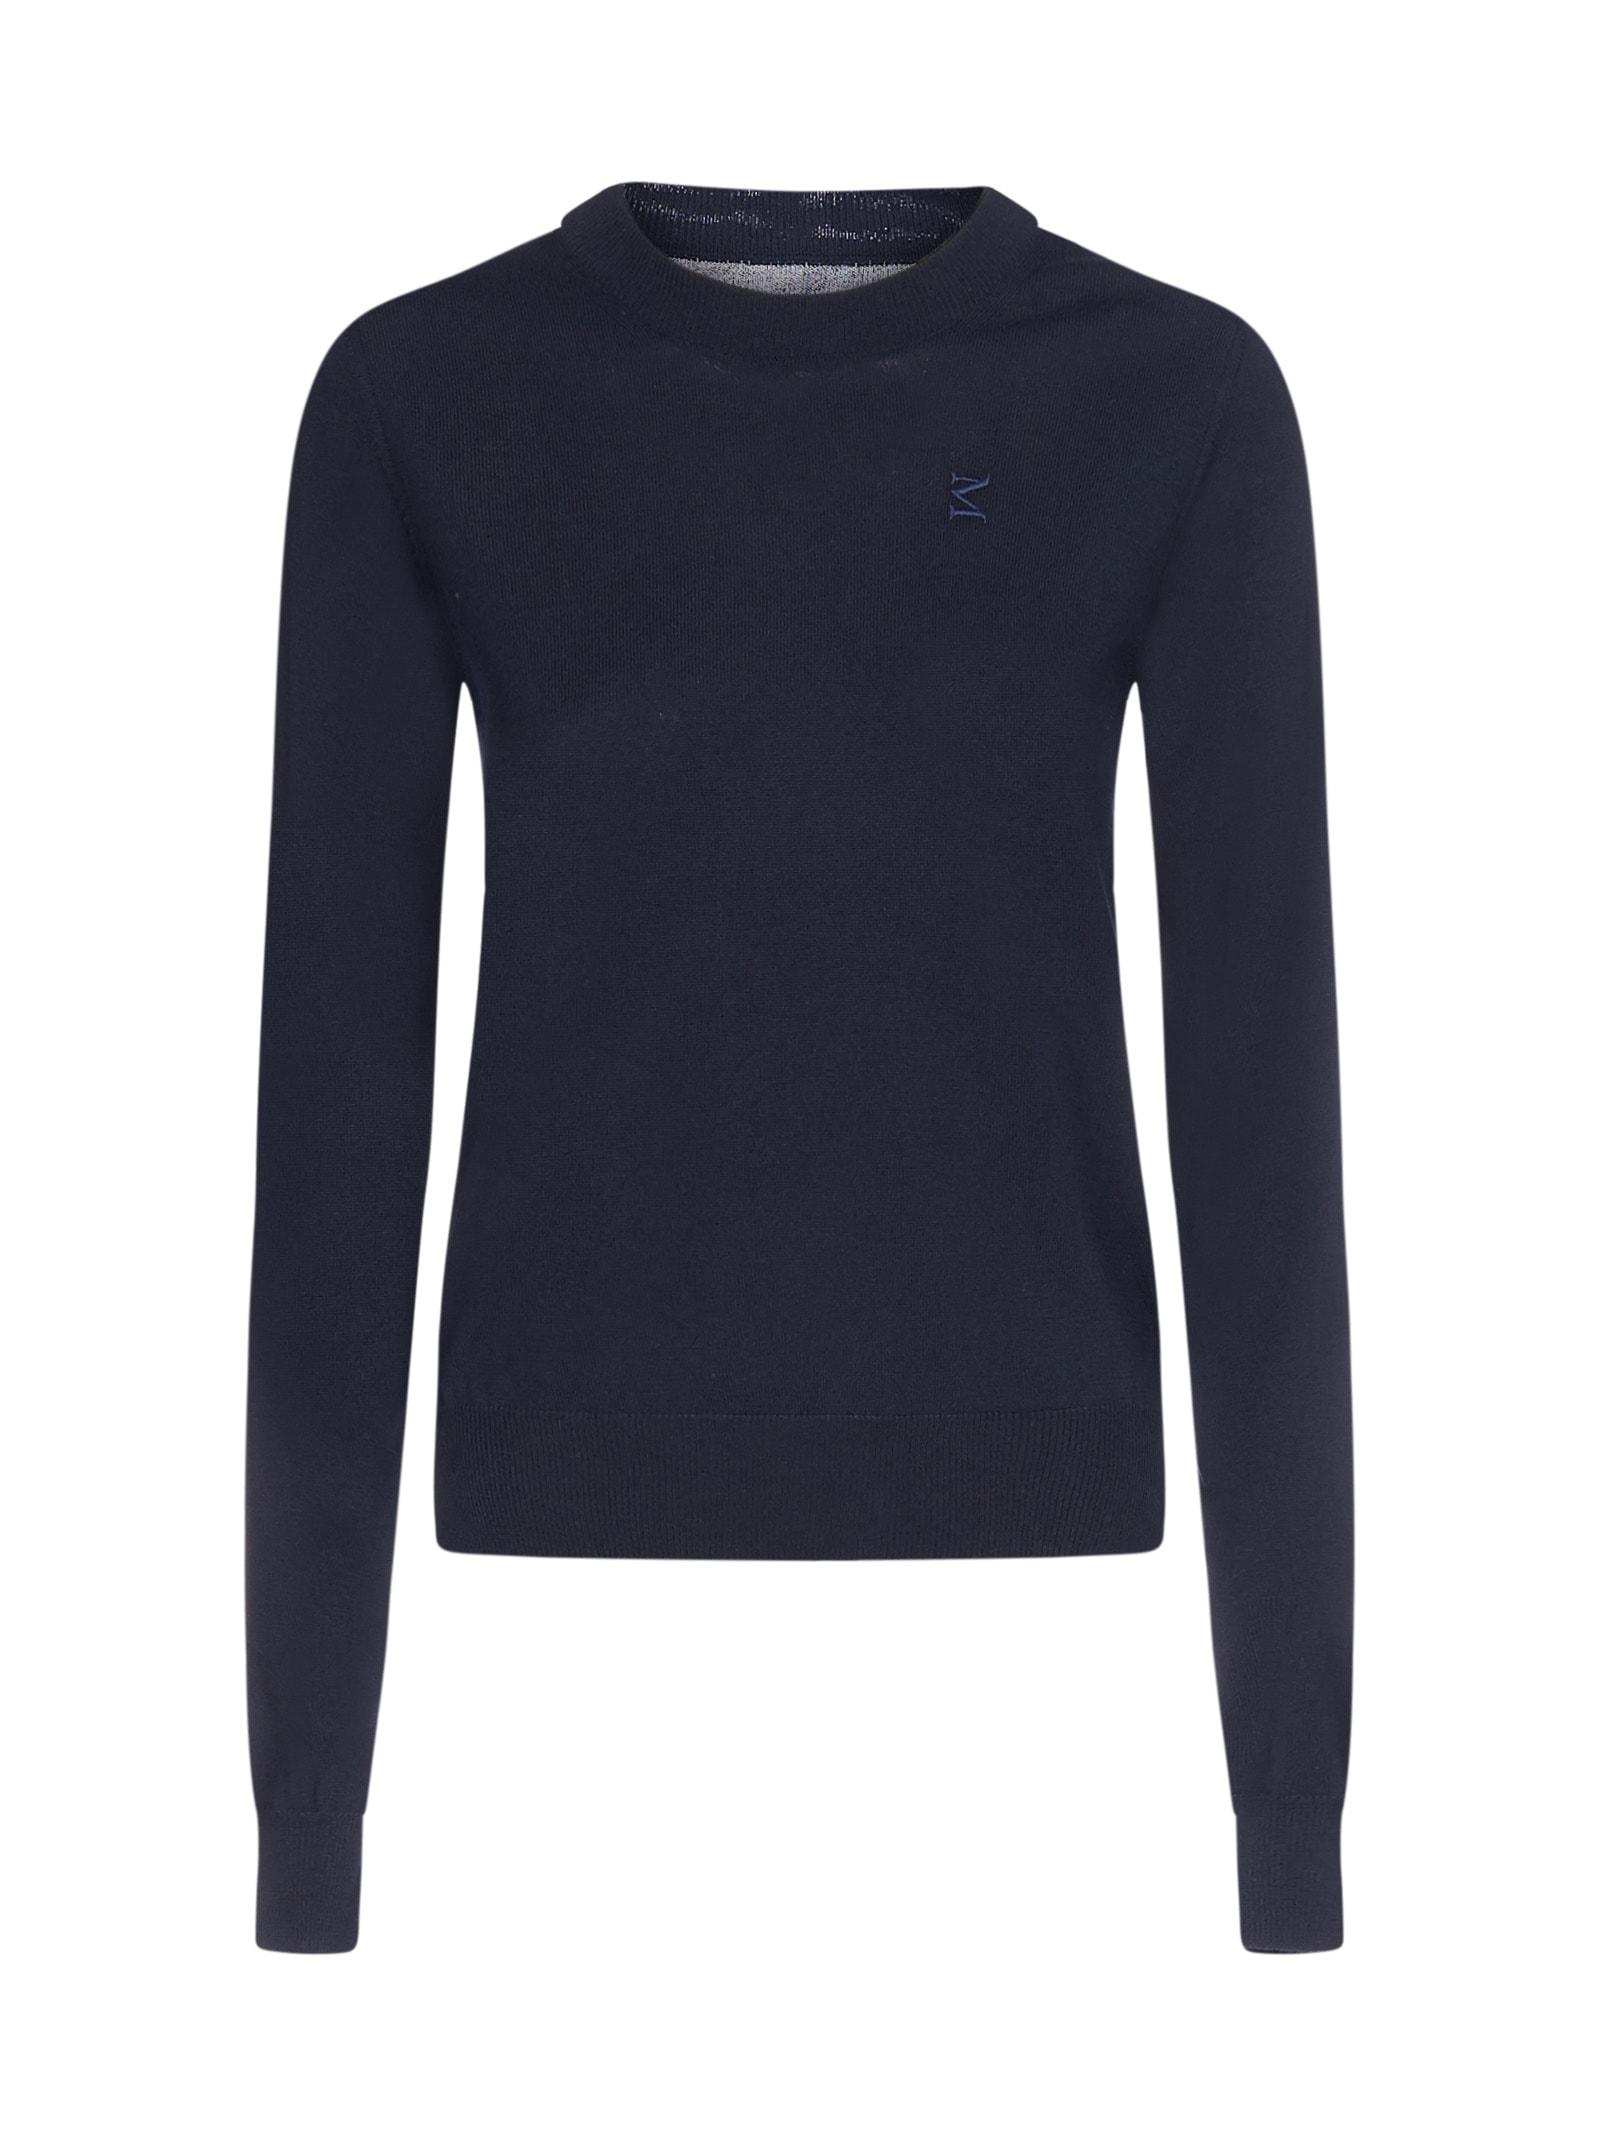 Maison Margiela Monogram Cotton Sweater